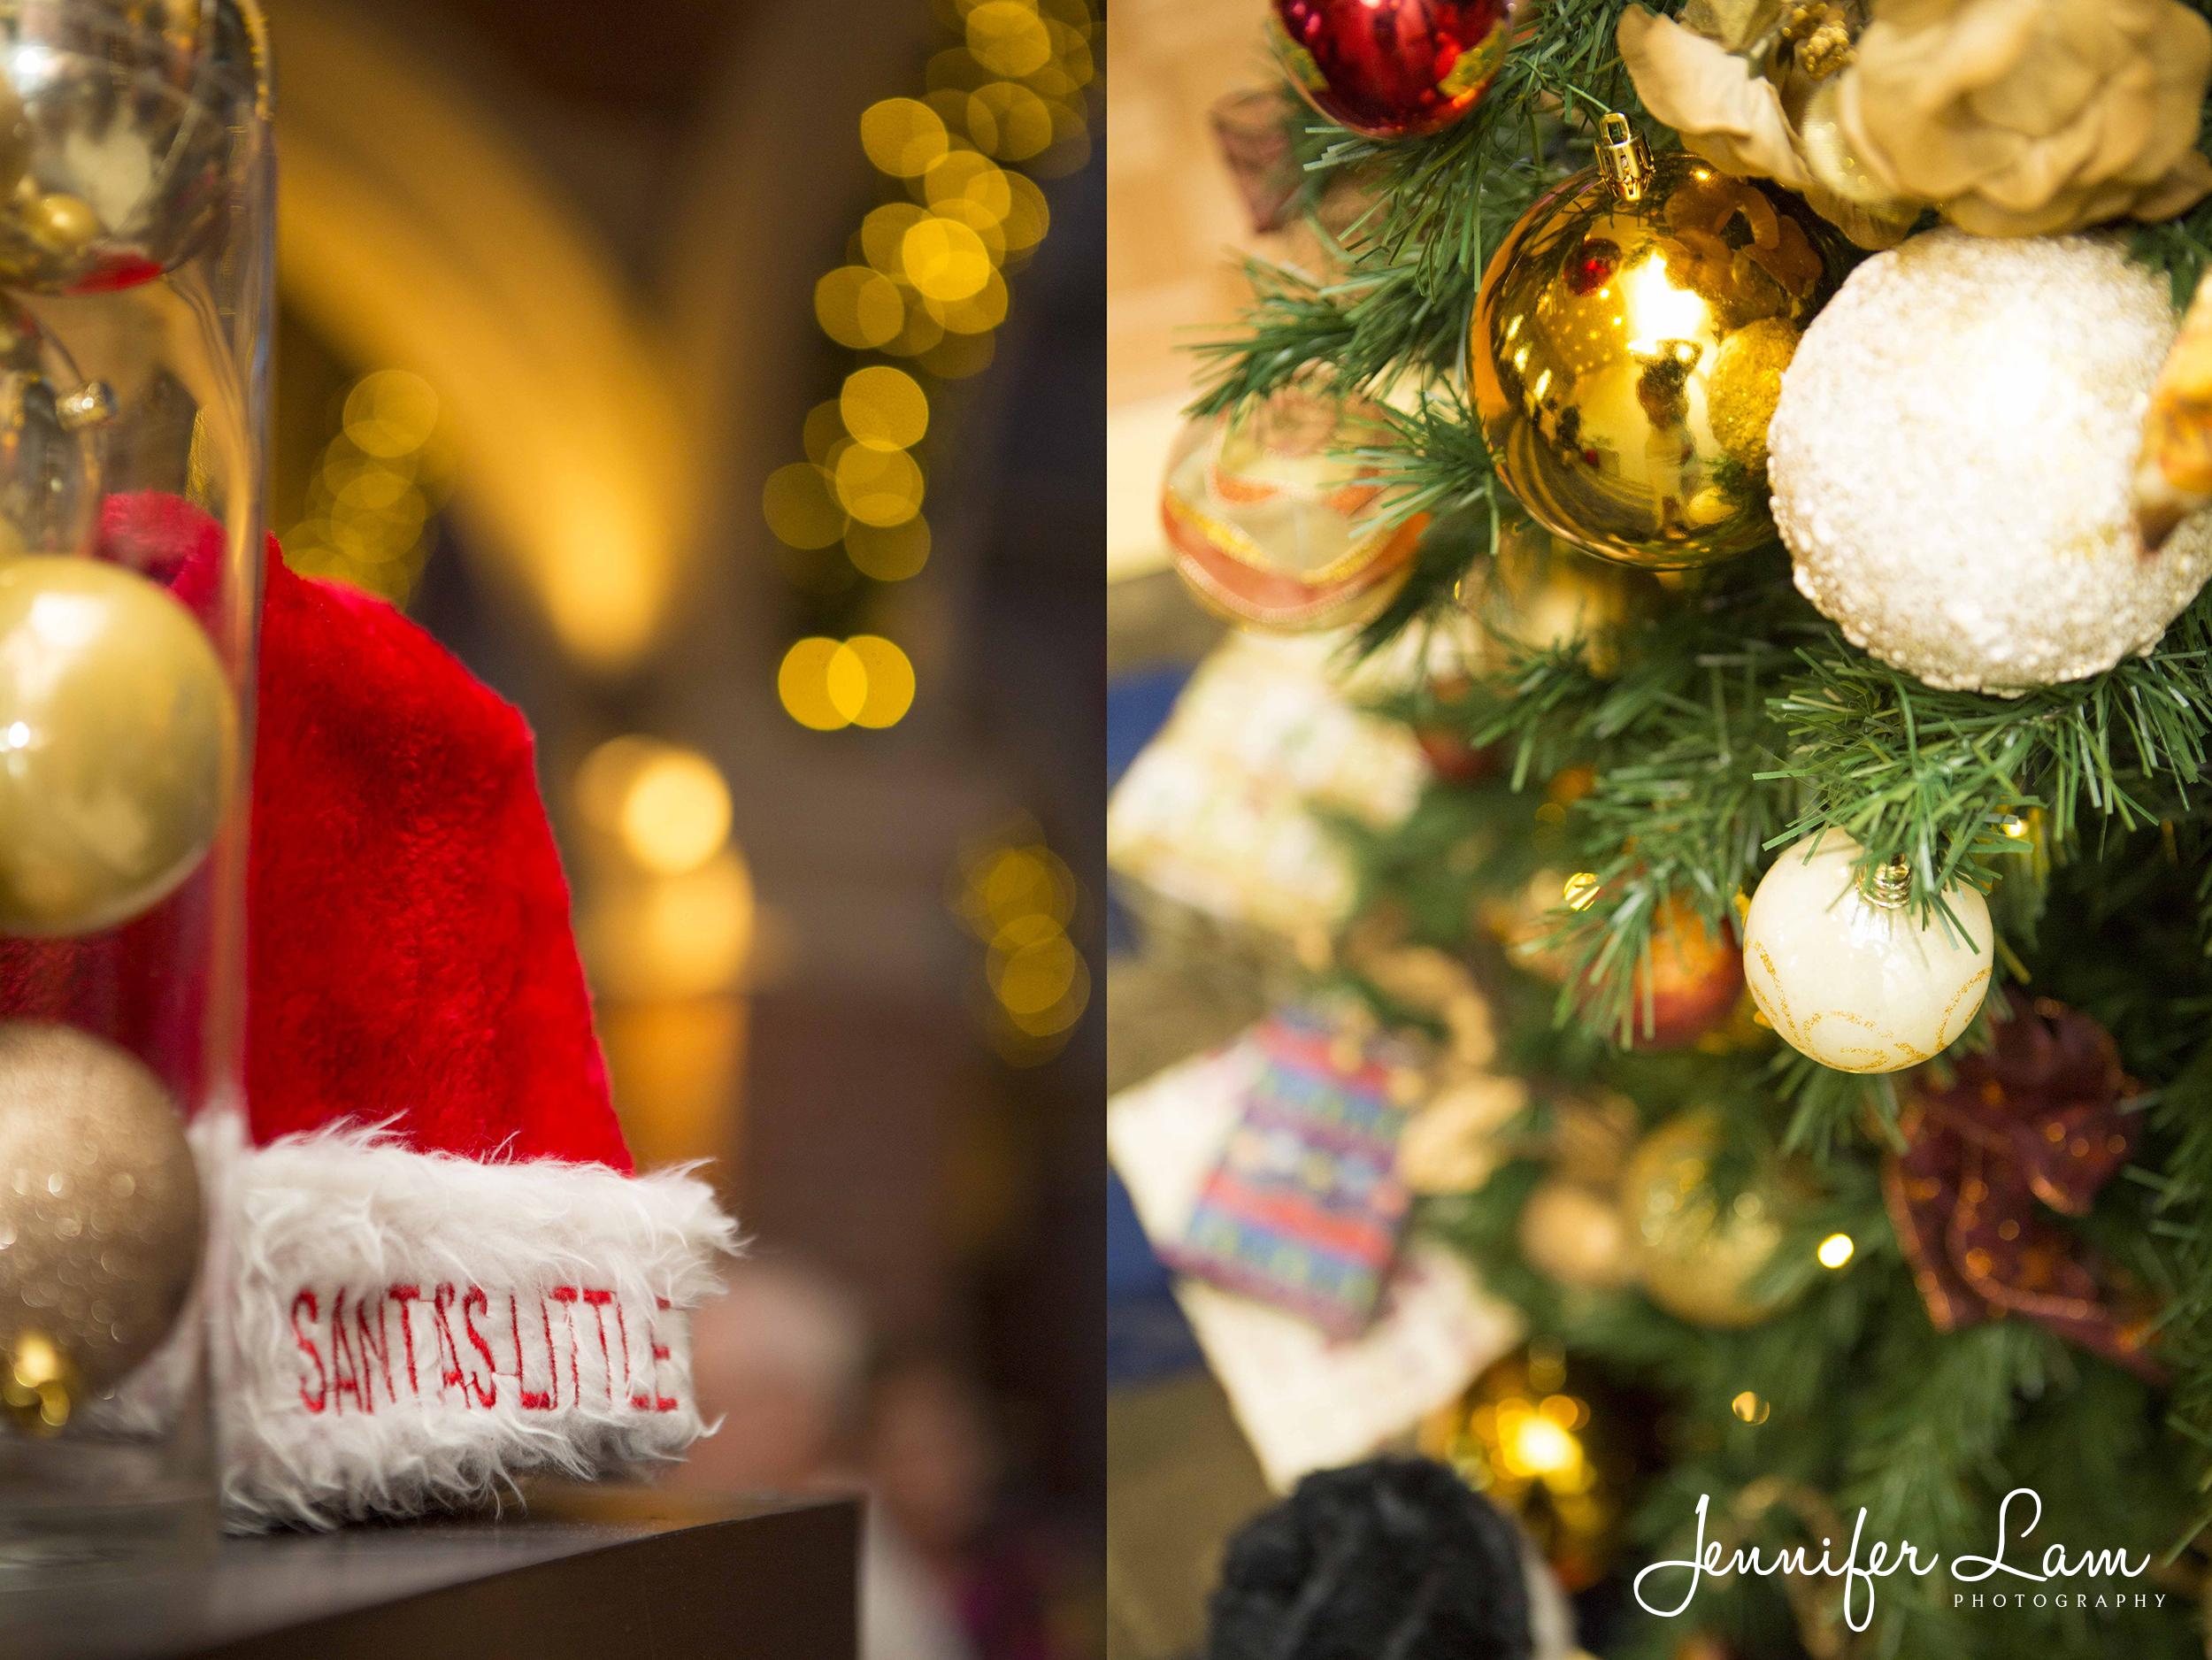 Christmas 2015 - Jennifer Lam Photography (2)A.jpg